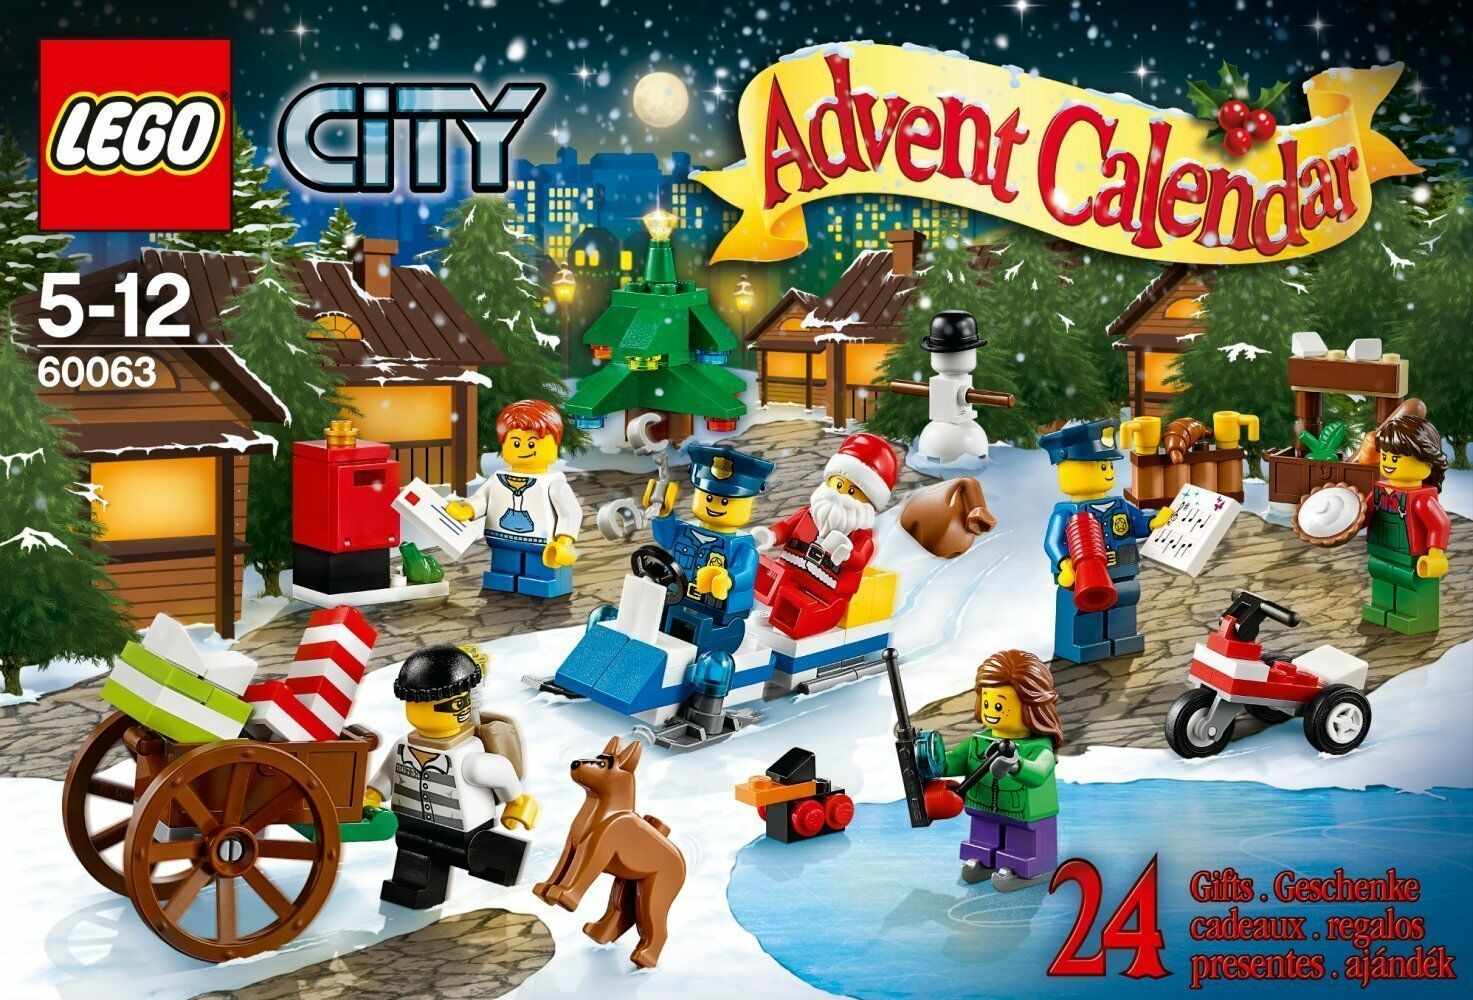 Lego City 60063 Advent Calendar 2014 New Ovp Misb